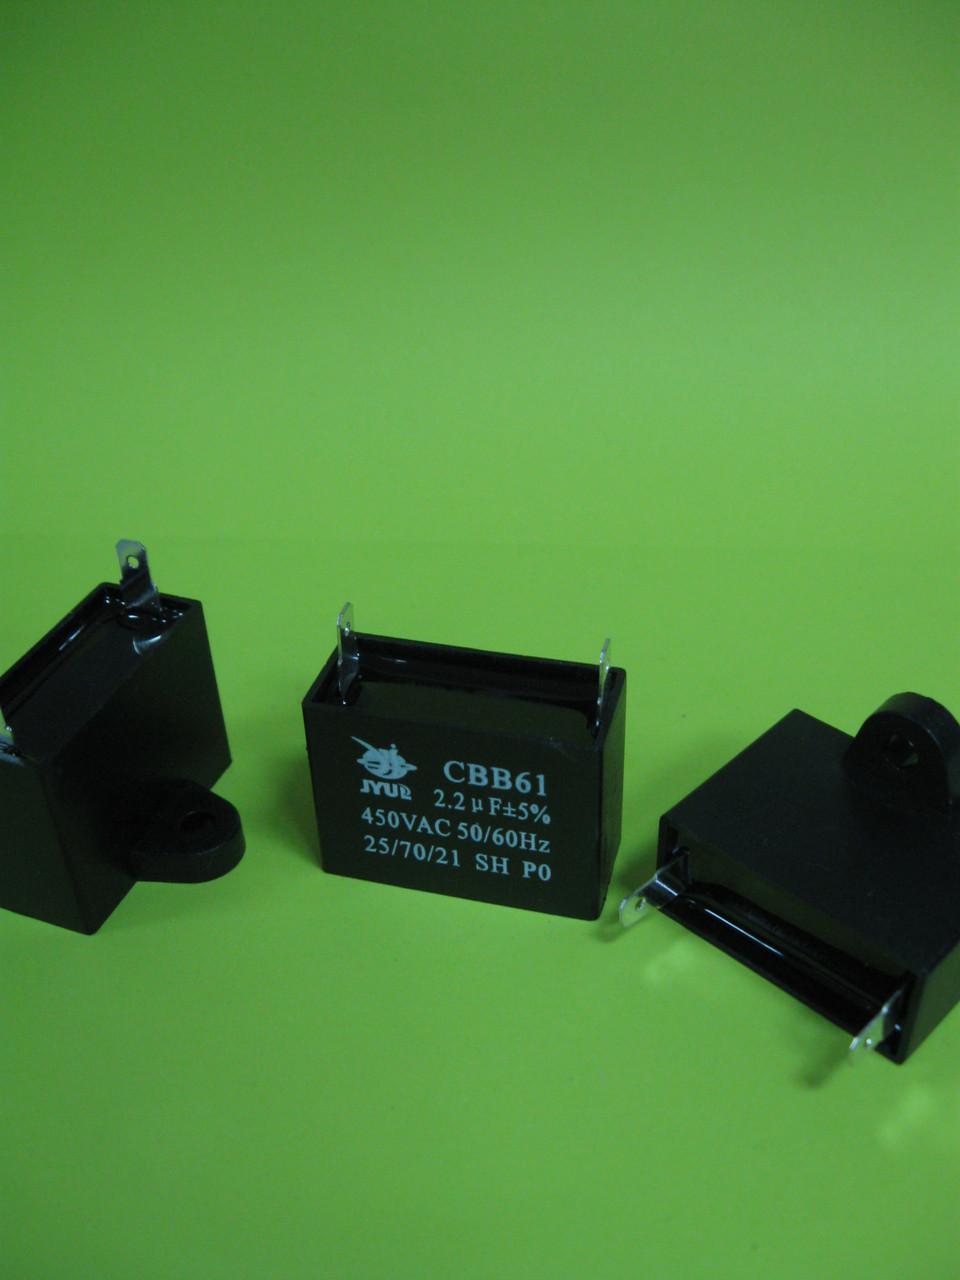 Конденсатор CBB-61 2,2 uF 450VAC на клемах 5мм JYUL